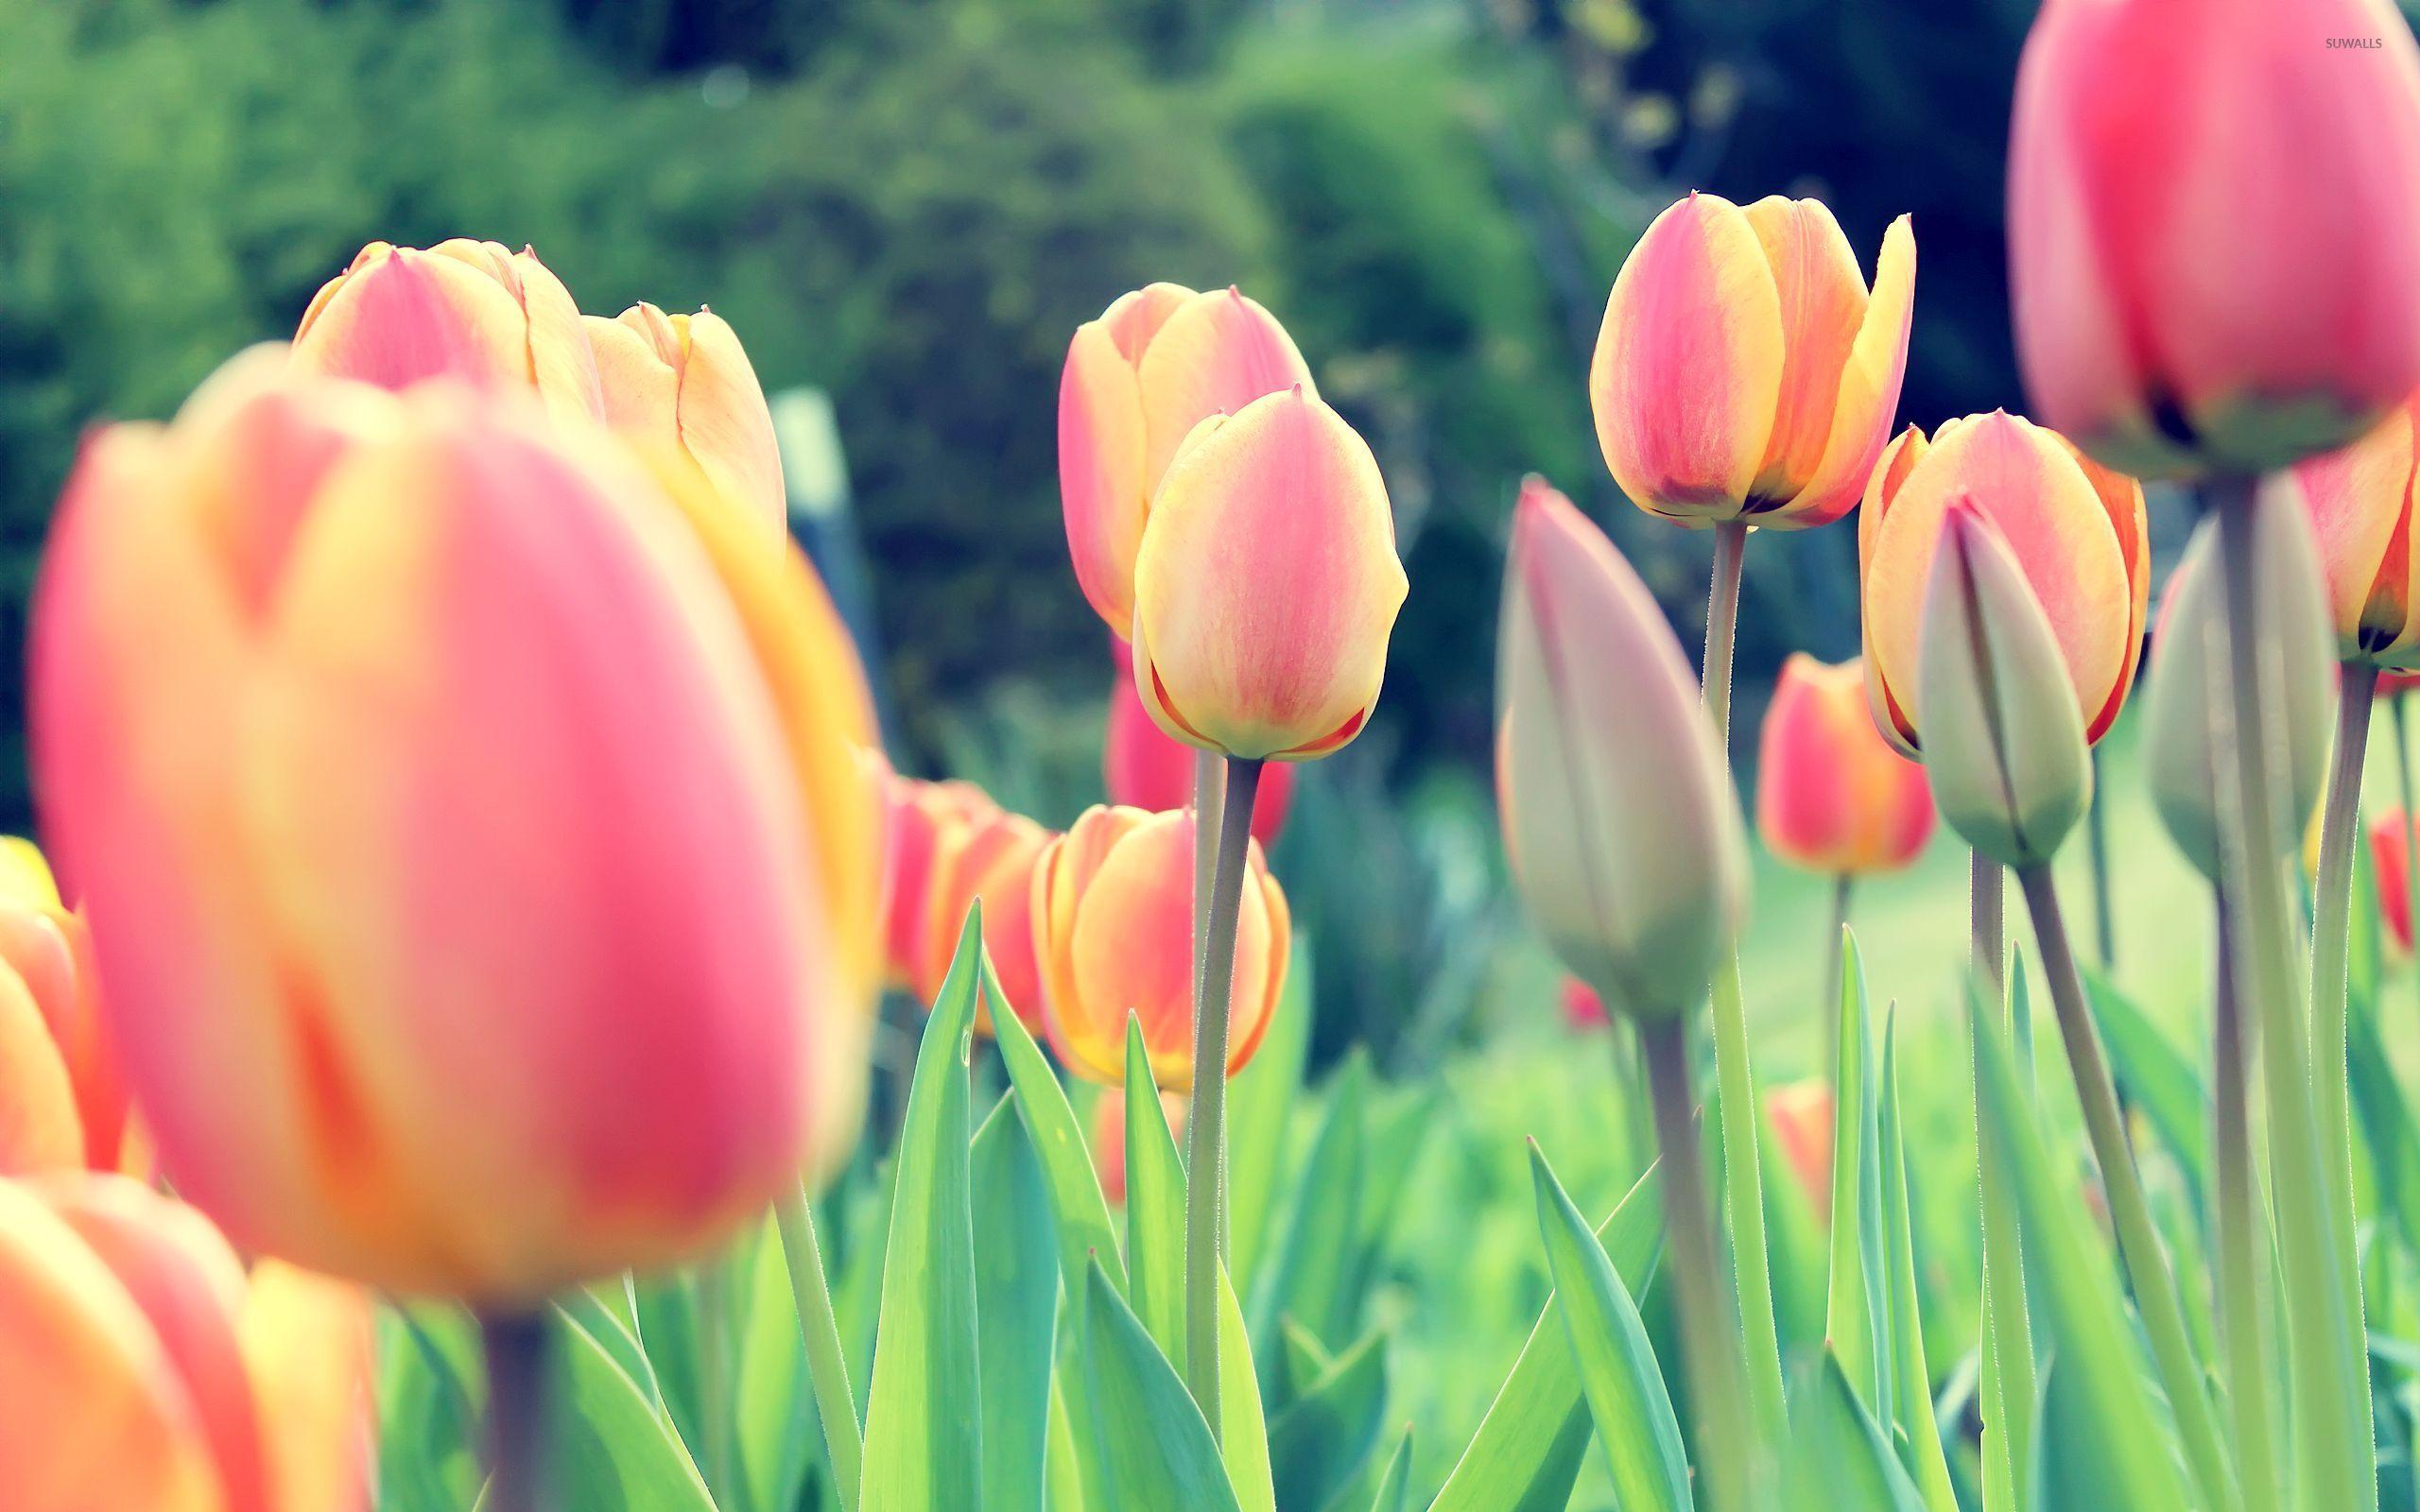 Orange Tulips Bouquet wallpaper.